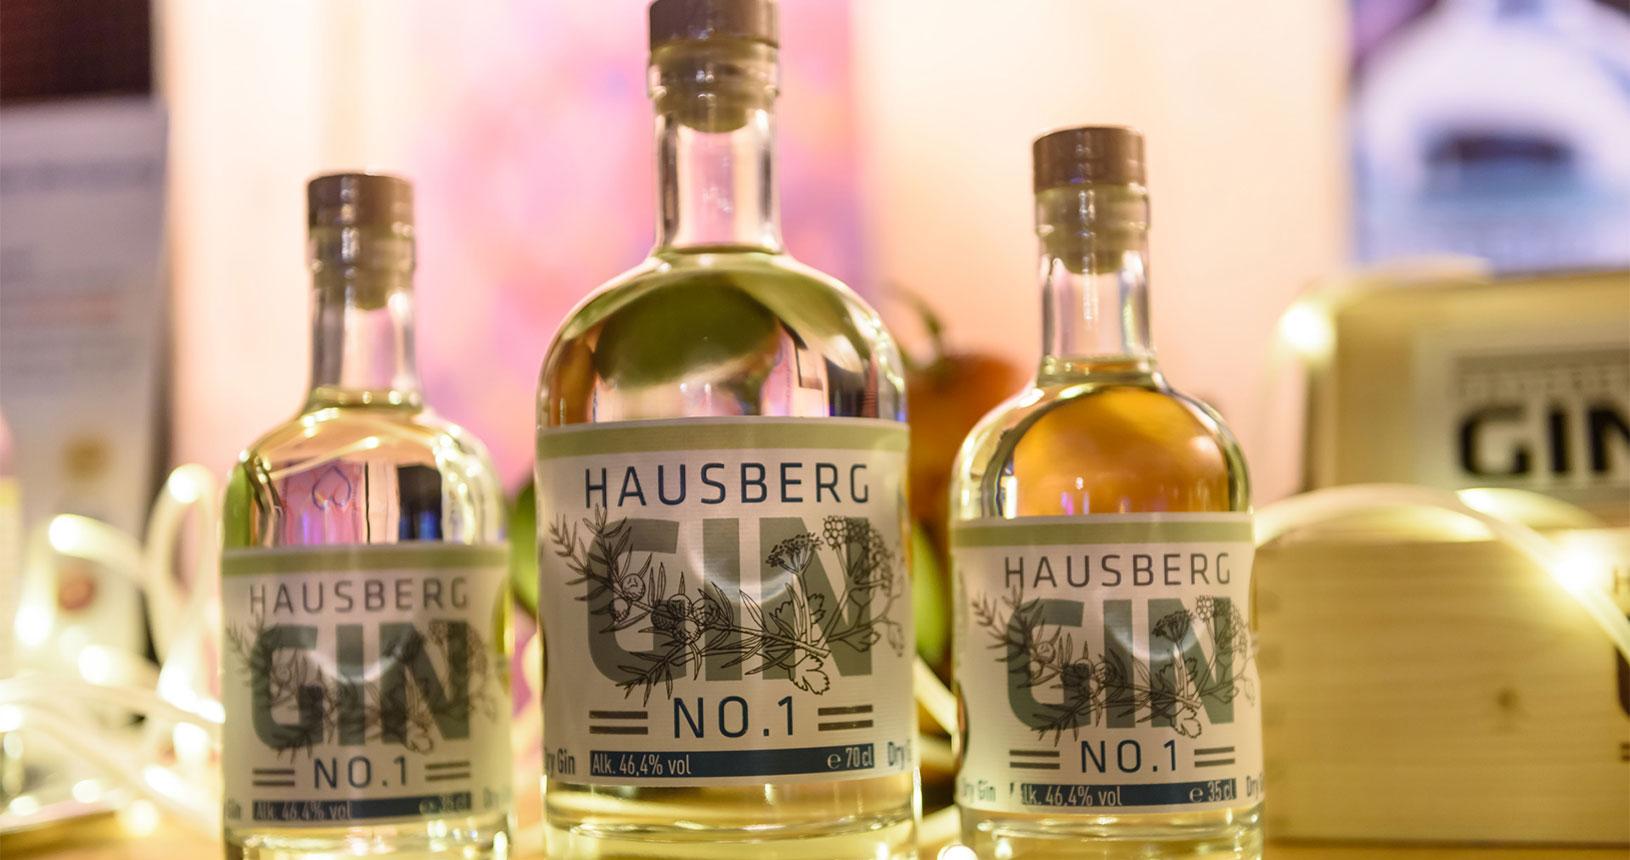 Hausberg Gin Bottle Market Bremen